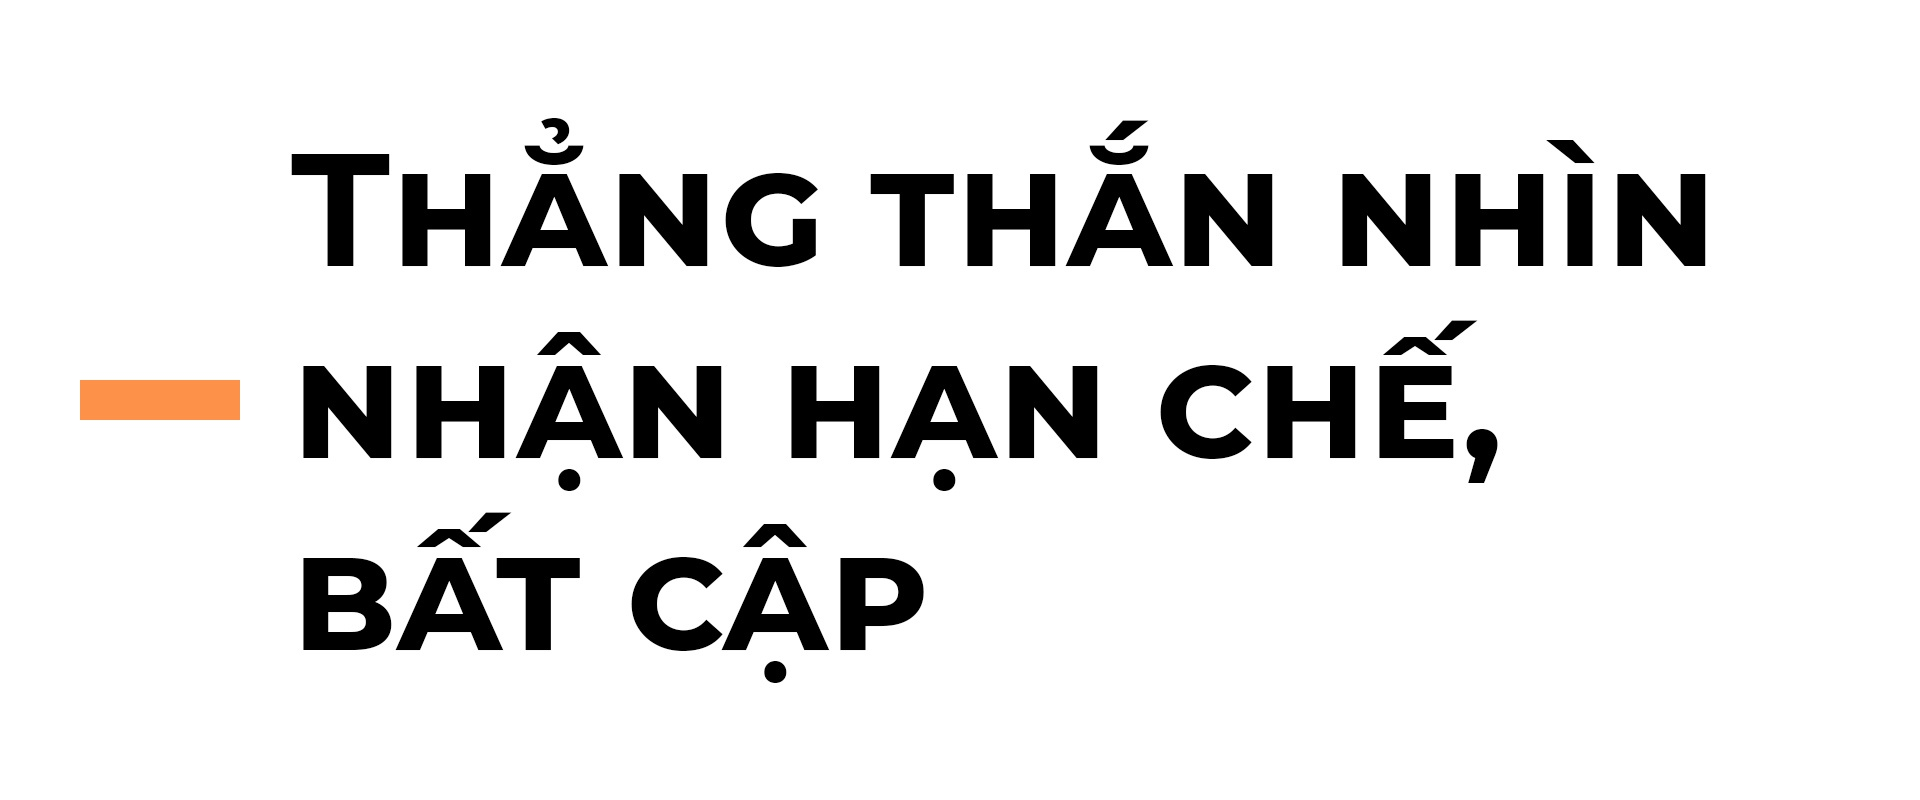 Bo truong Phung Xuan Nha: 'Niem tin xa hoi la nguon luc cua giao duc' hinh anh 6